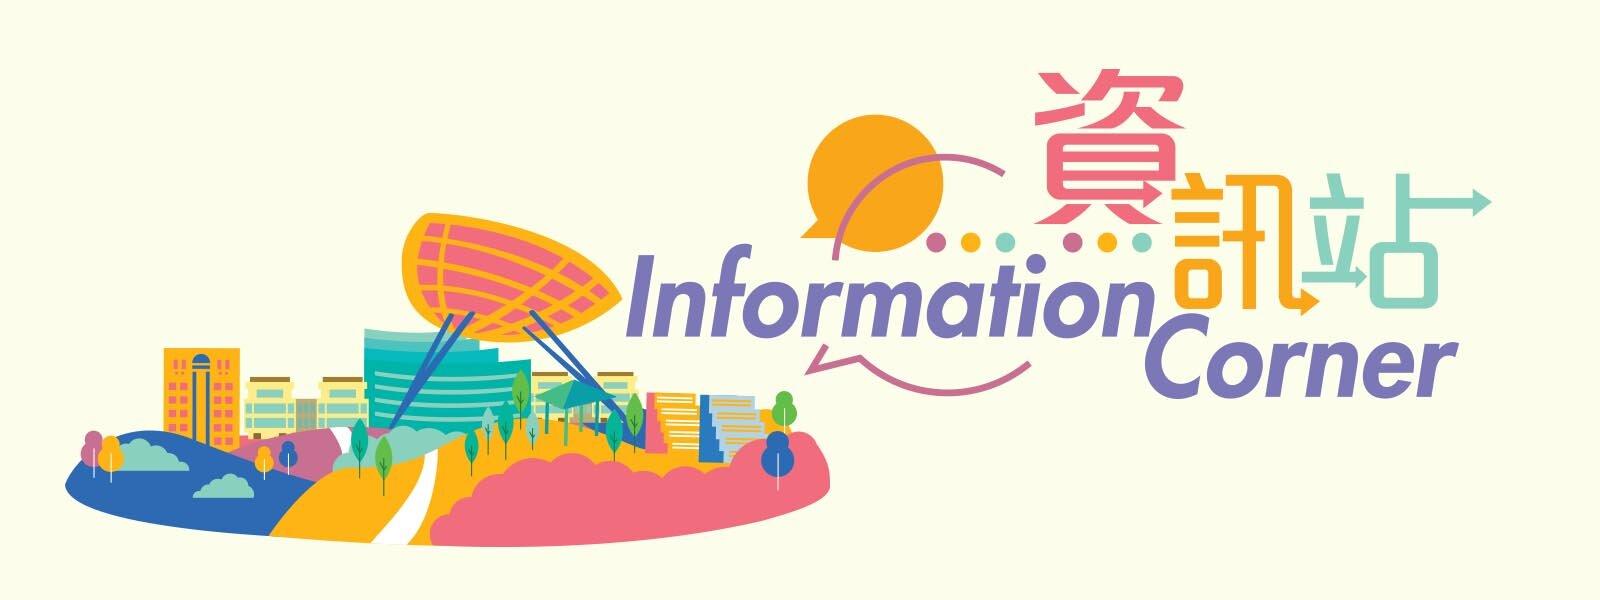 Information Corner